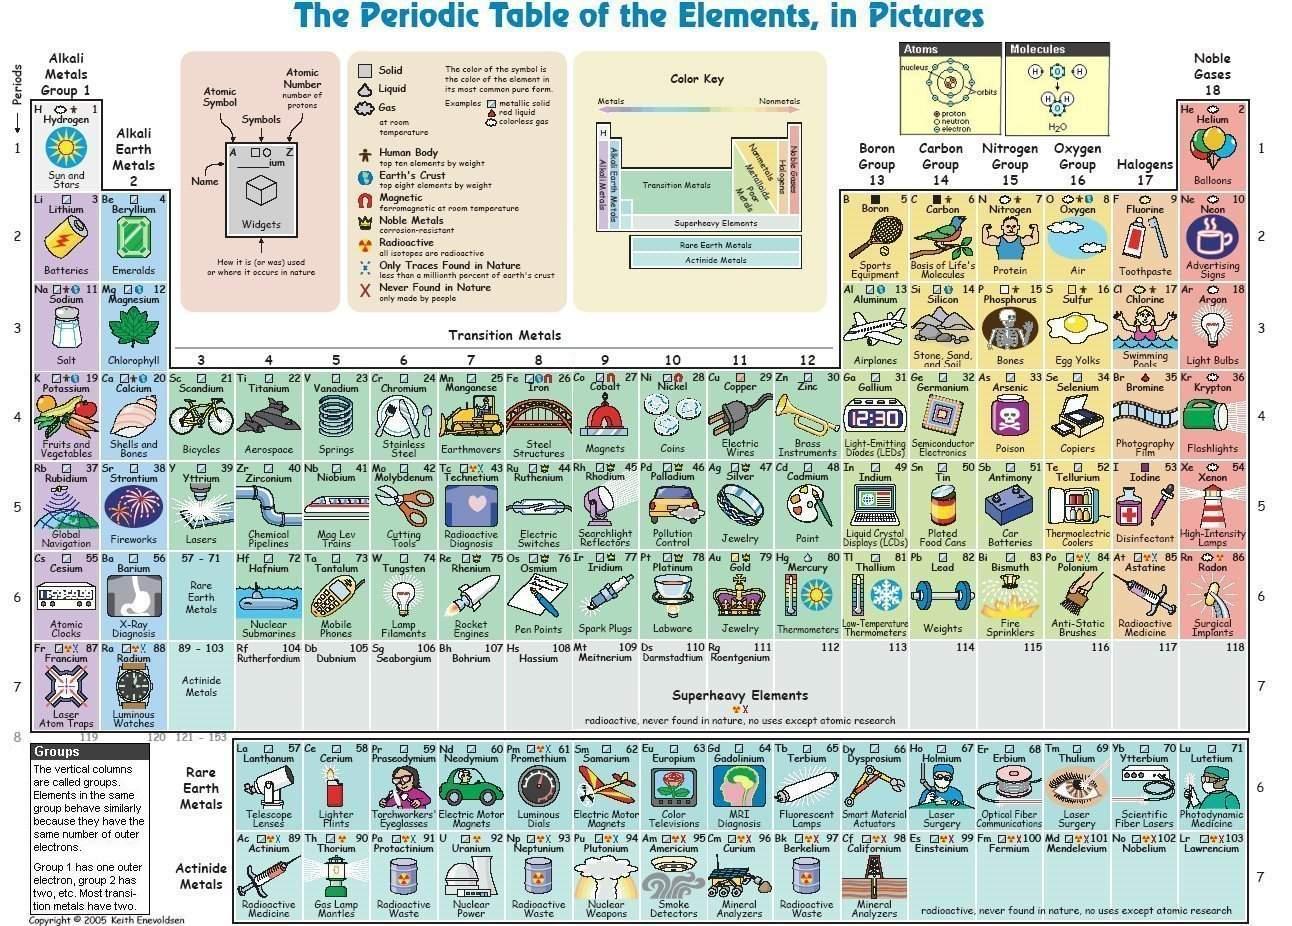 Biologia sb tabla peridica ejemplo de elementos tabla peridica ejemplo de elementos urtaz Choice Image